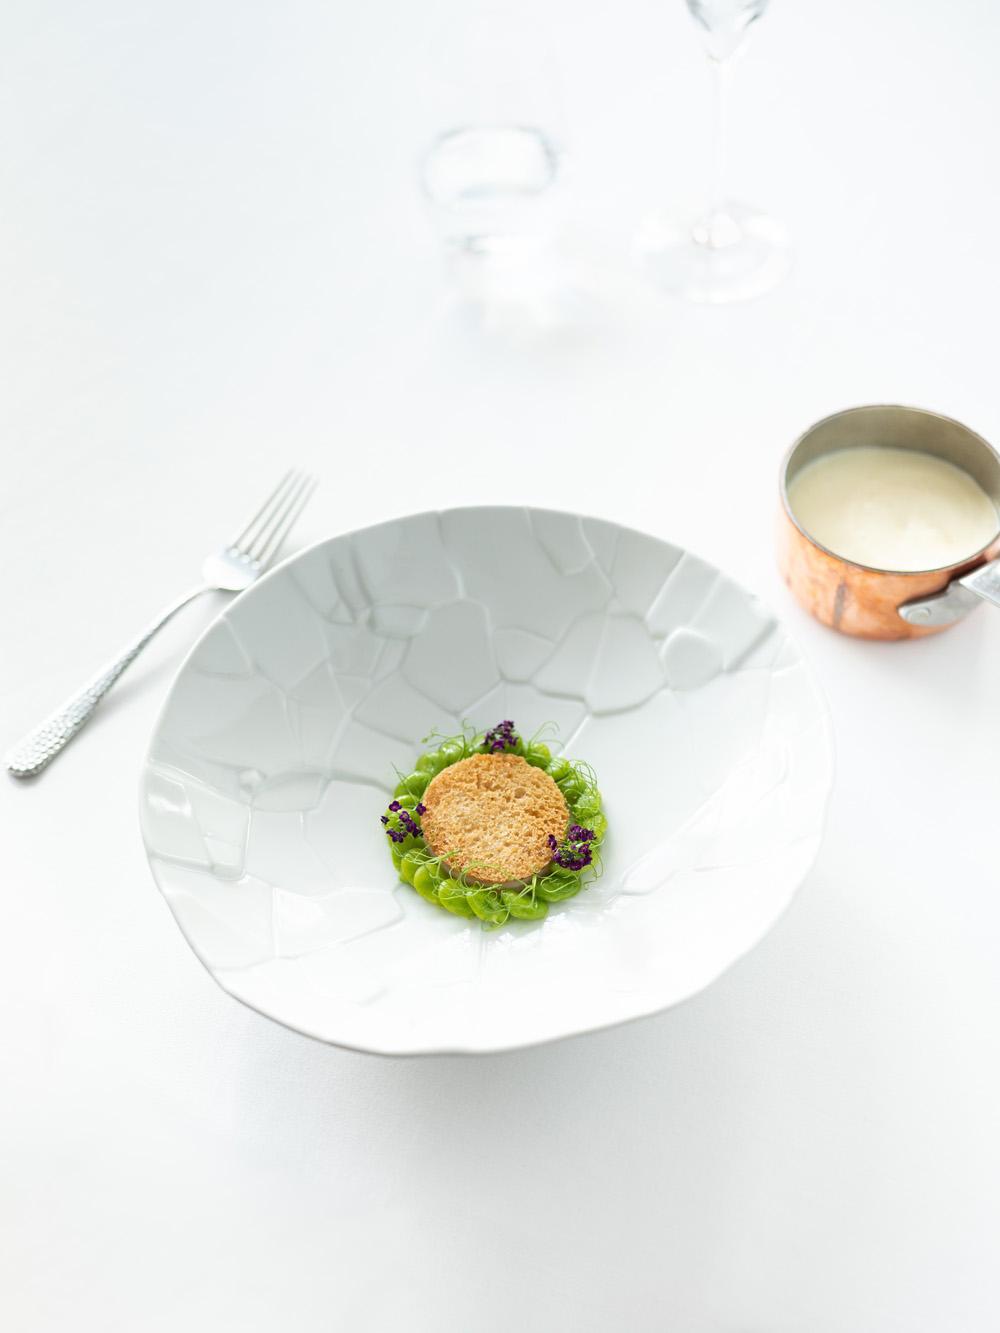 Alaise restaurant fotograf mats dreyer stylist oslo michelin star